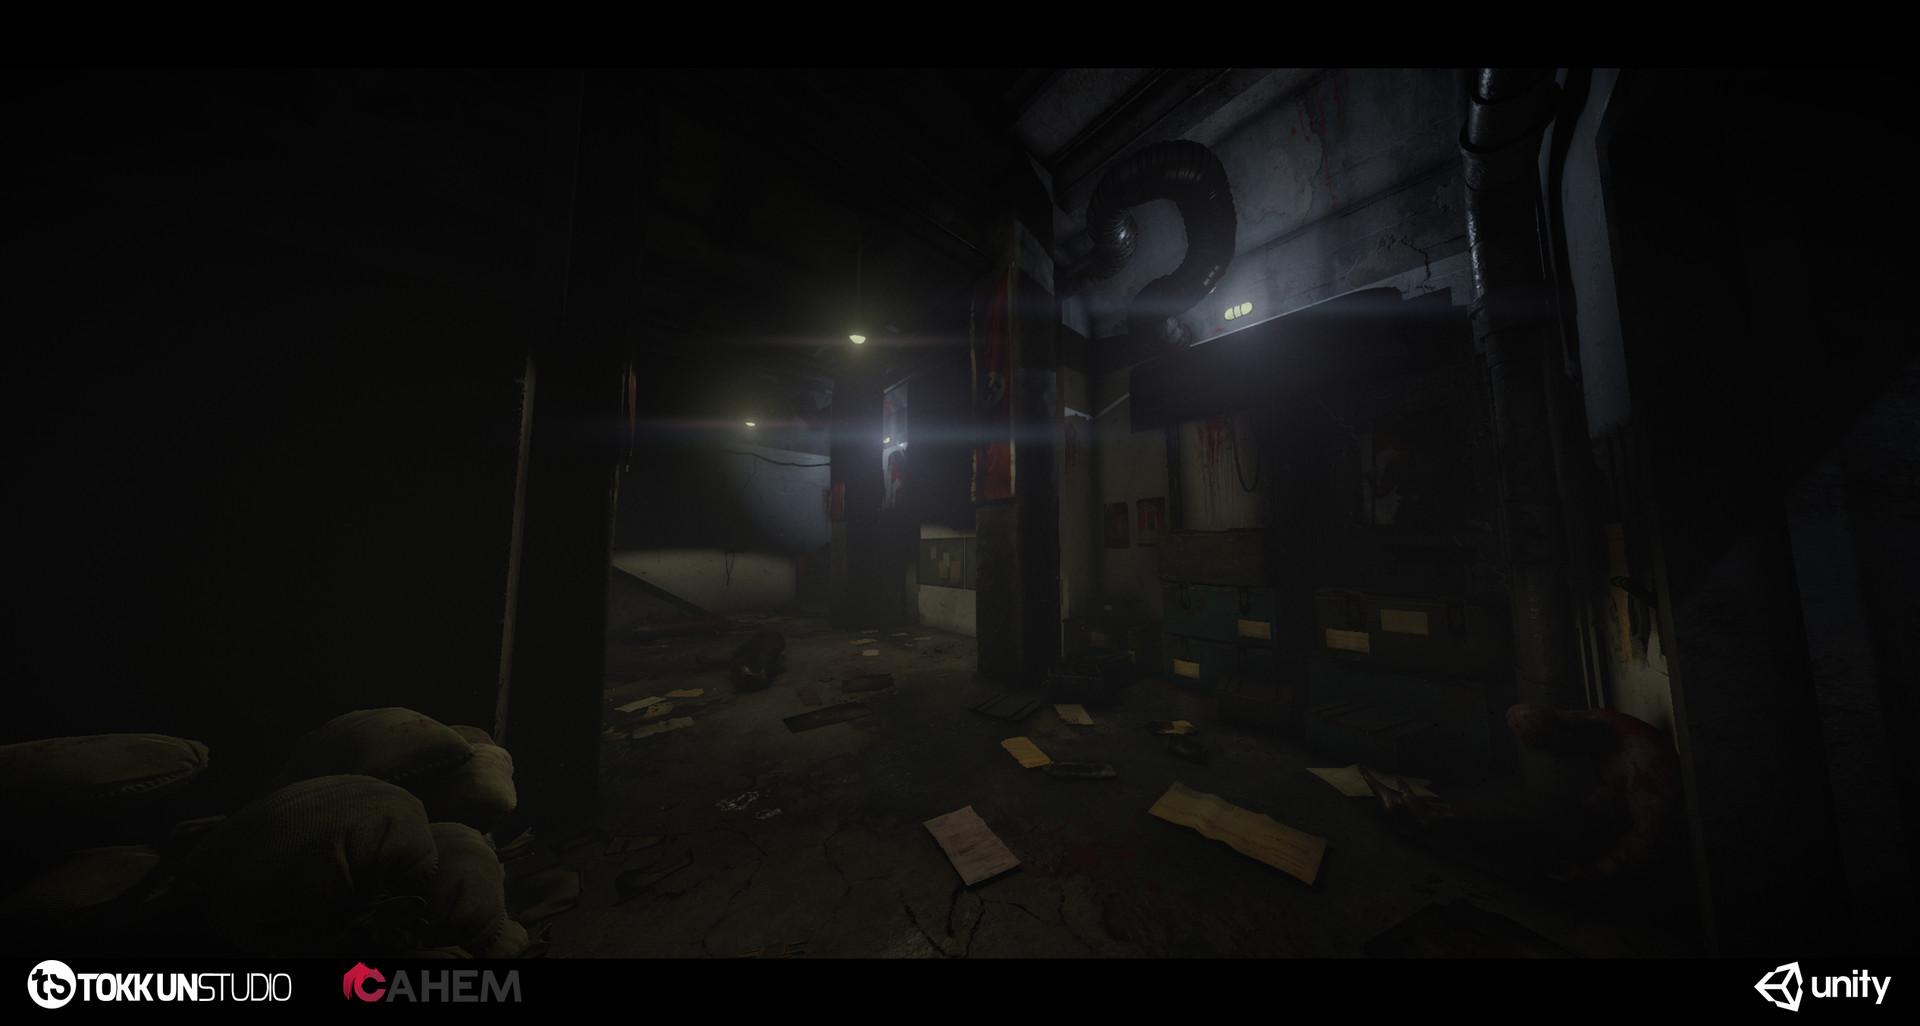 Tokkun studio bunker shot 36